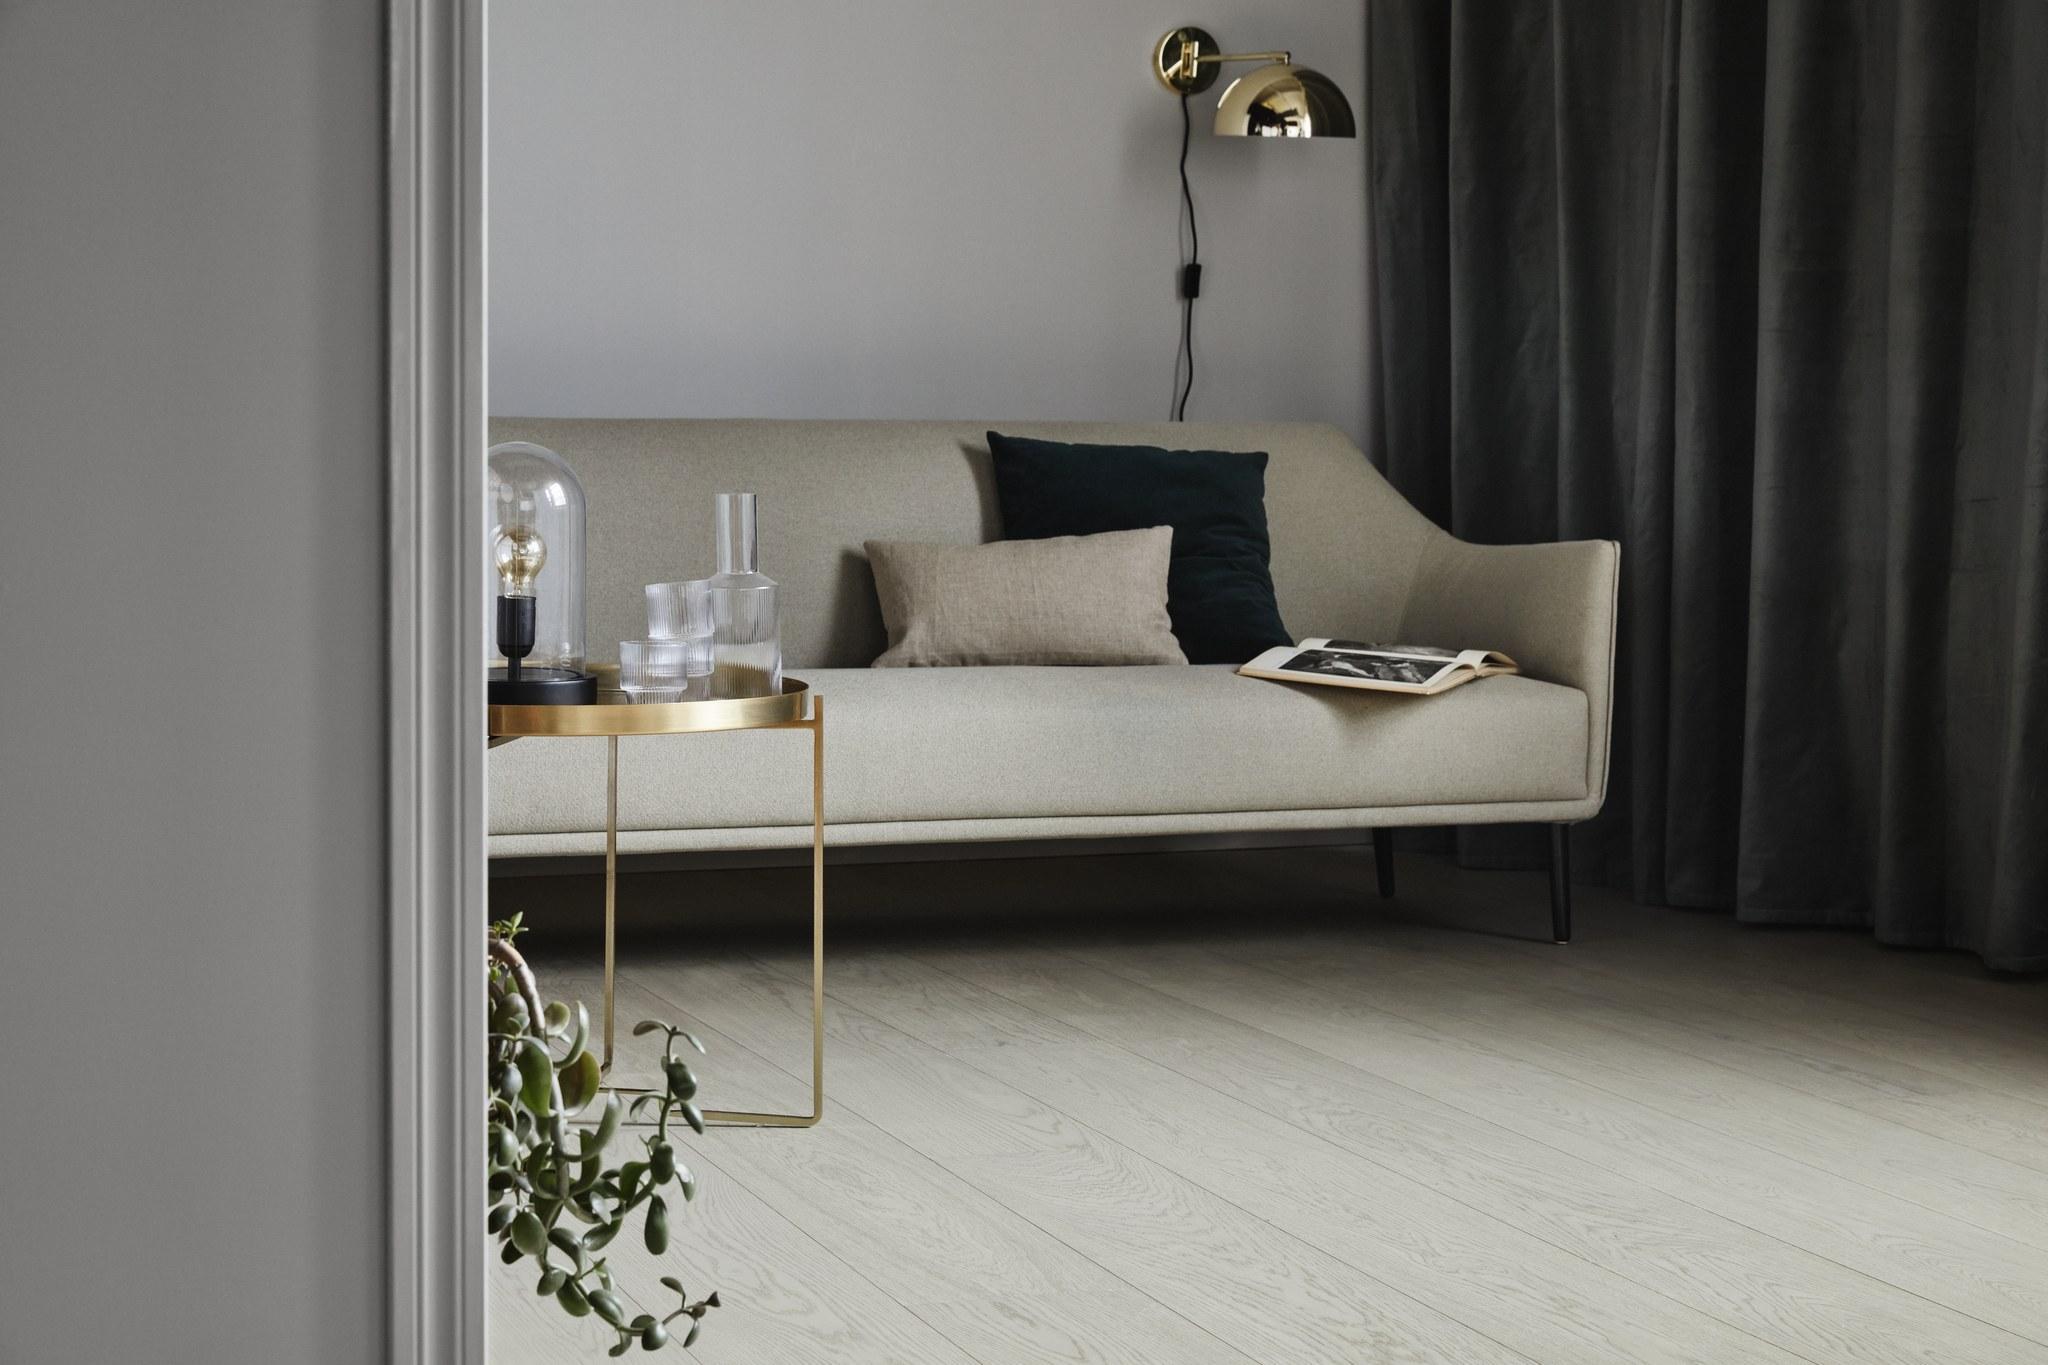 Timberwise parketti puulattia wooden floor parquet Tammi Oak Lyngen